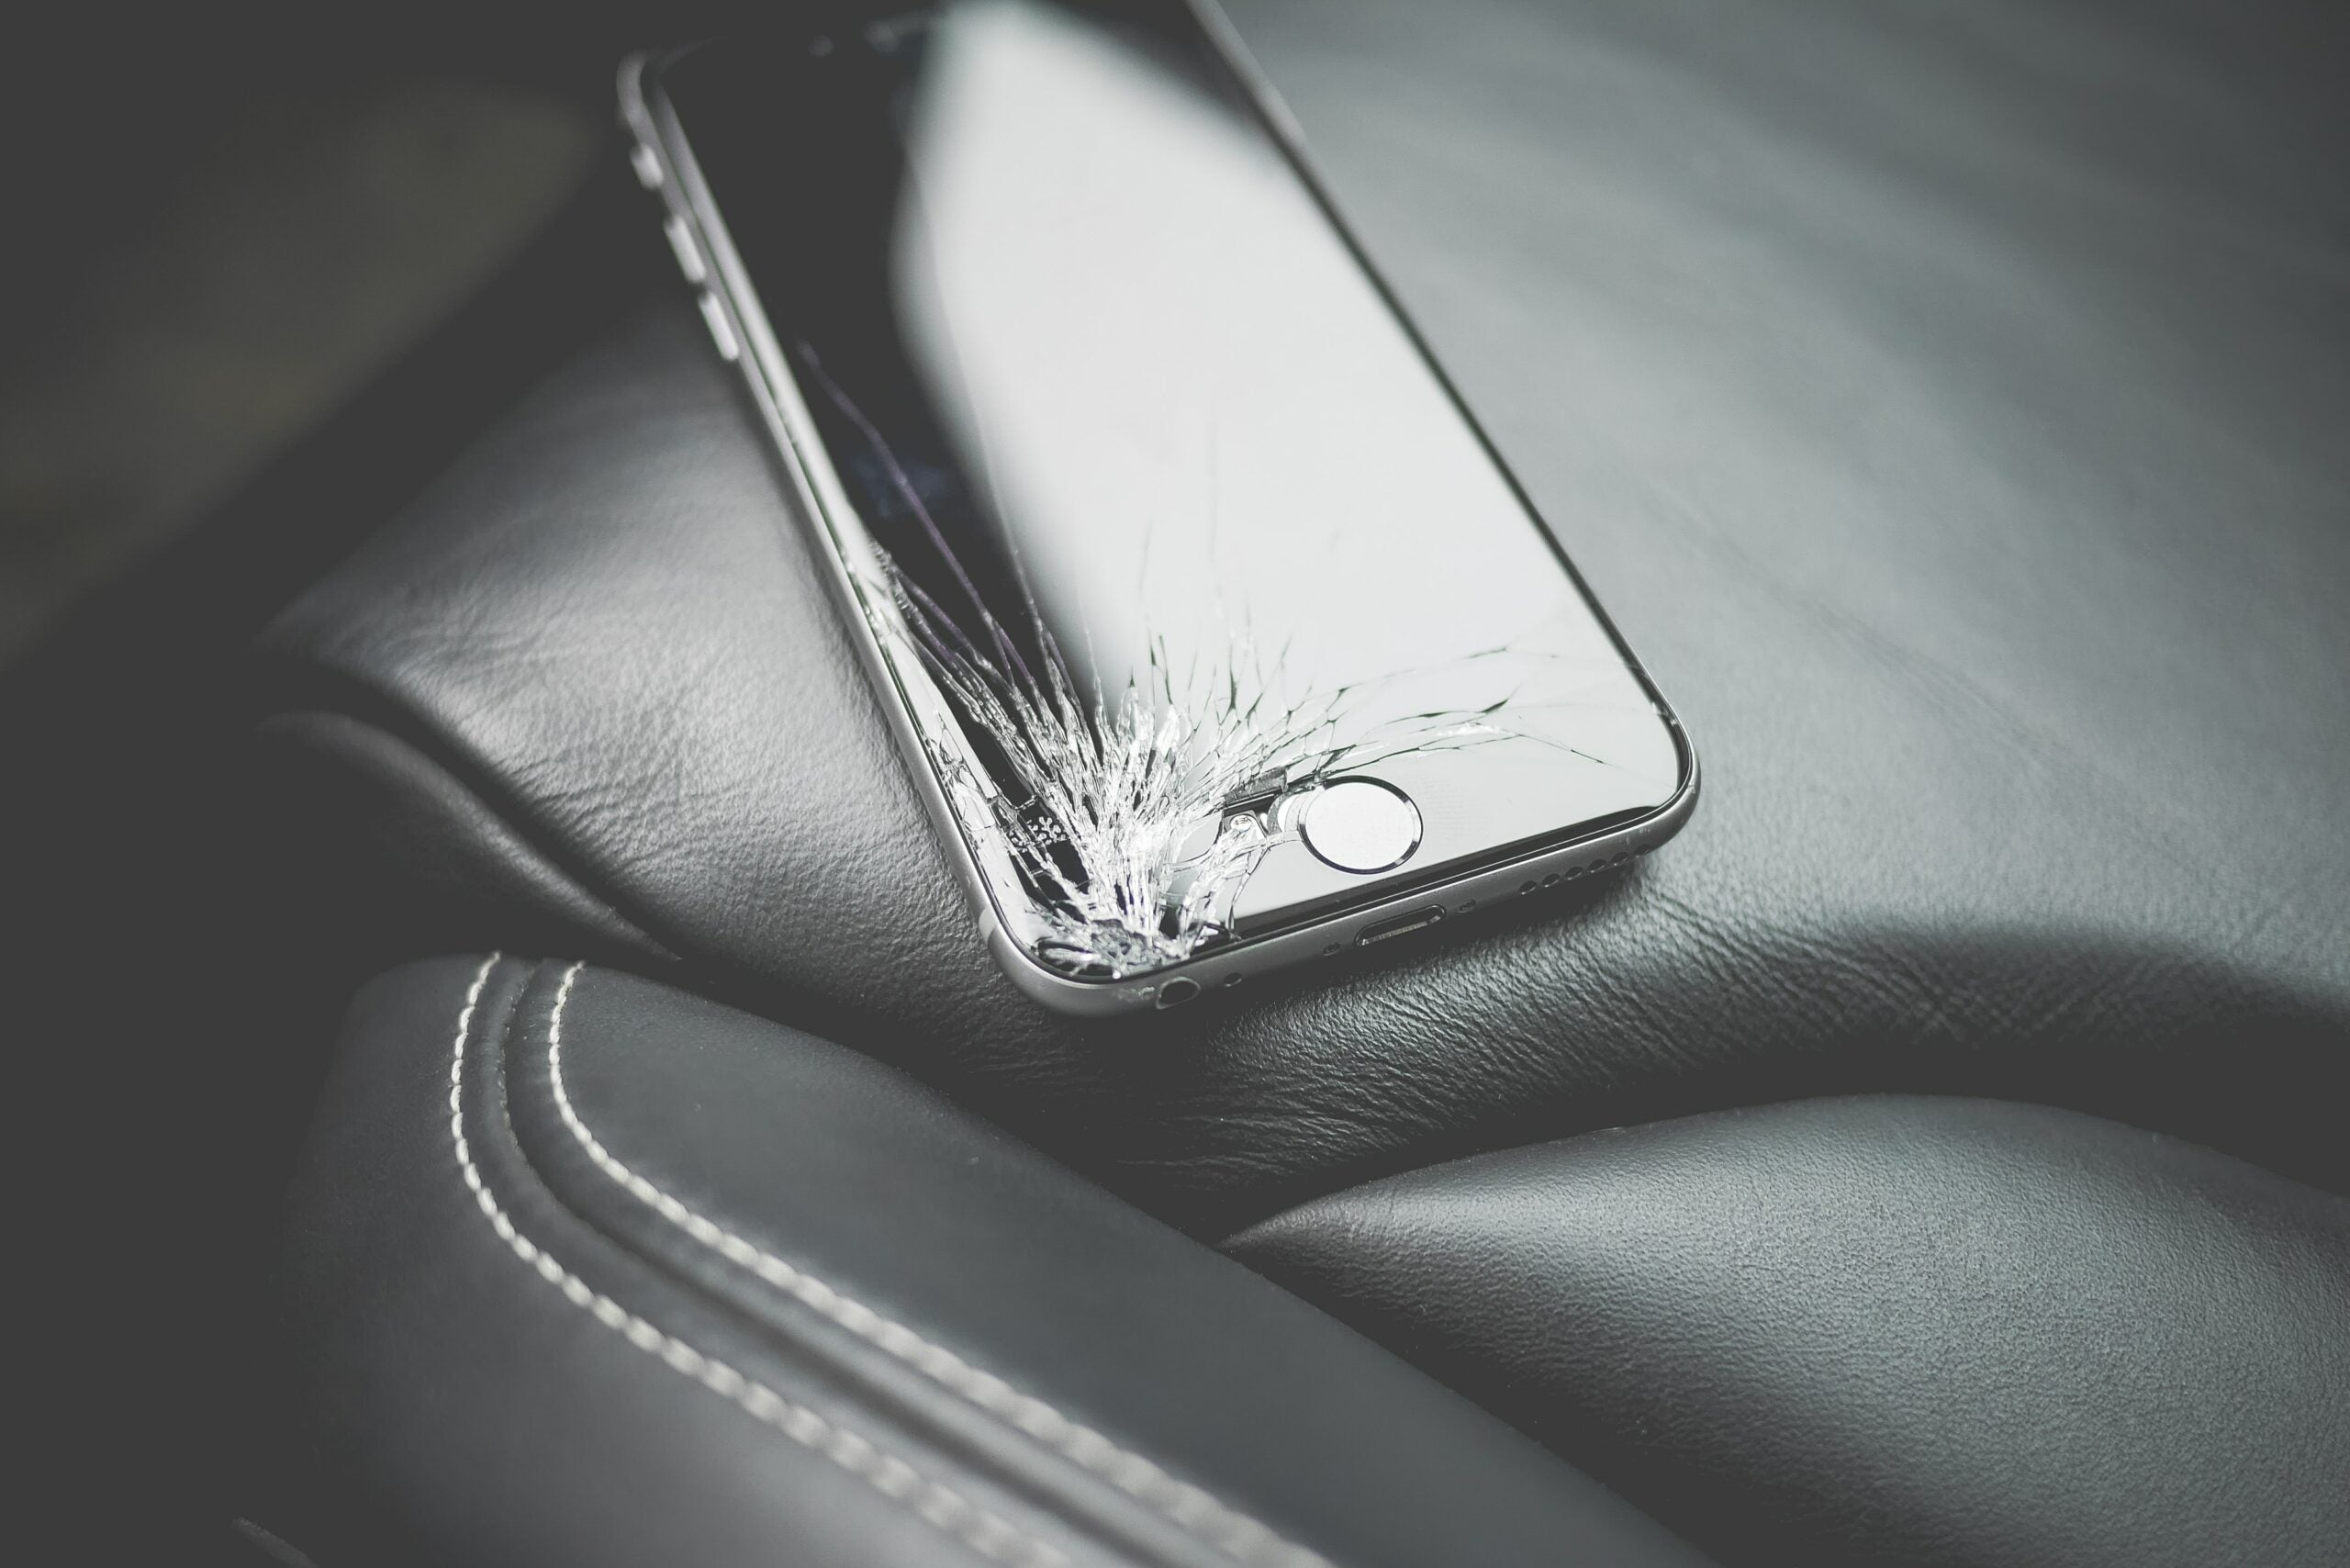 a cracked phone screen